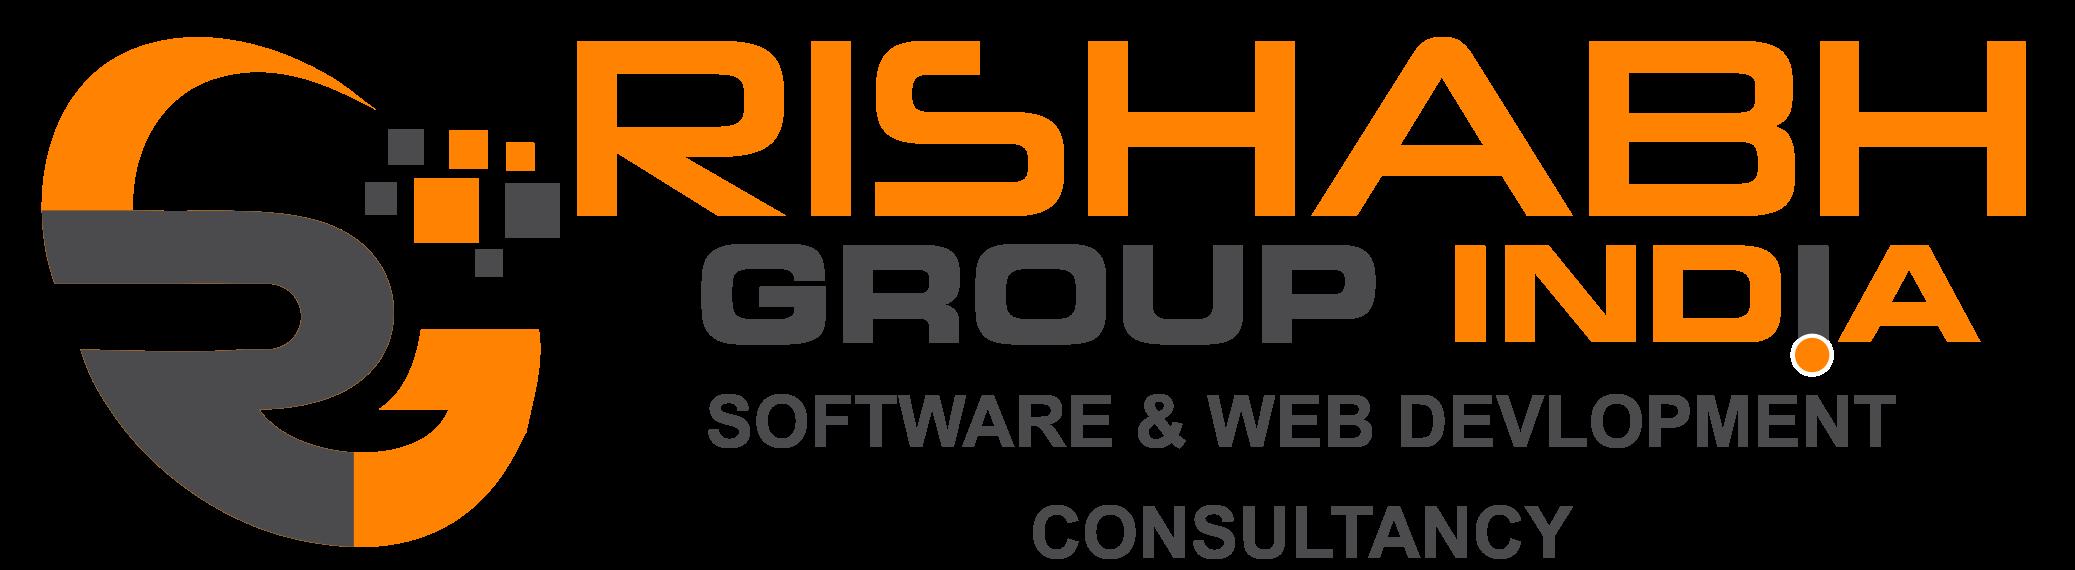 Rishabh Group India